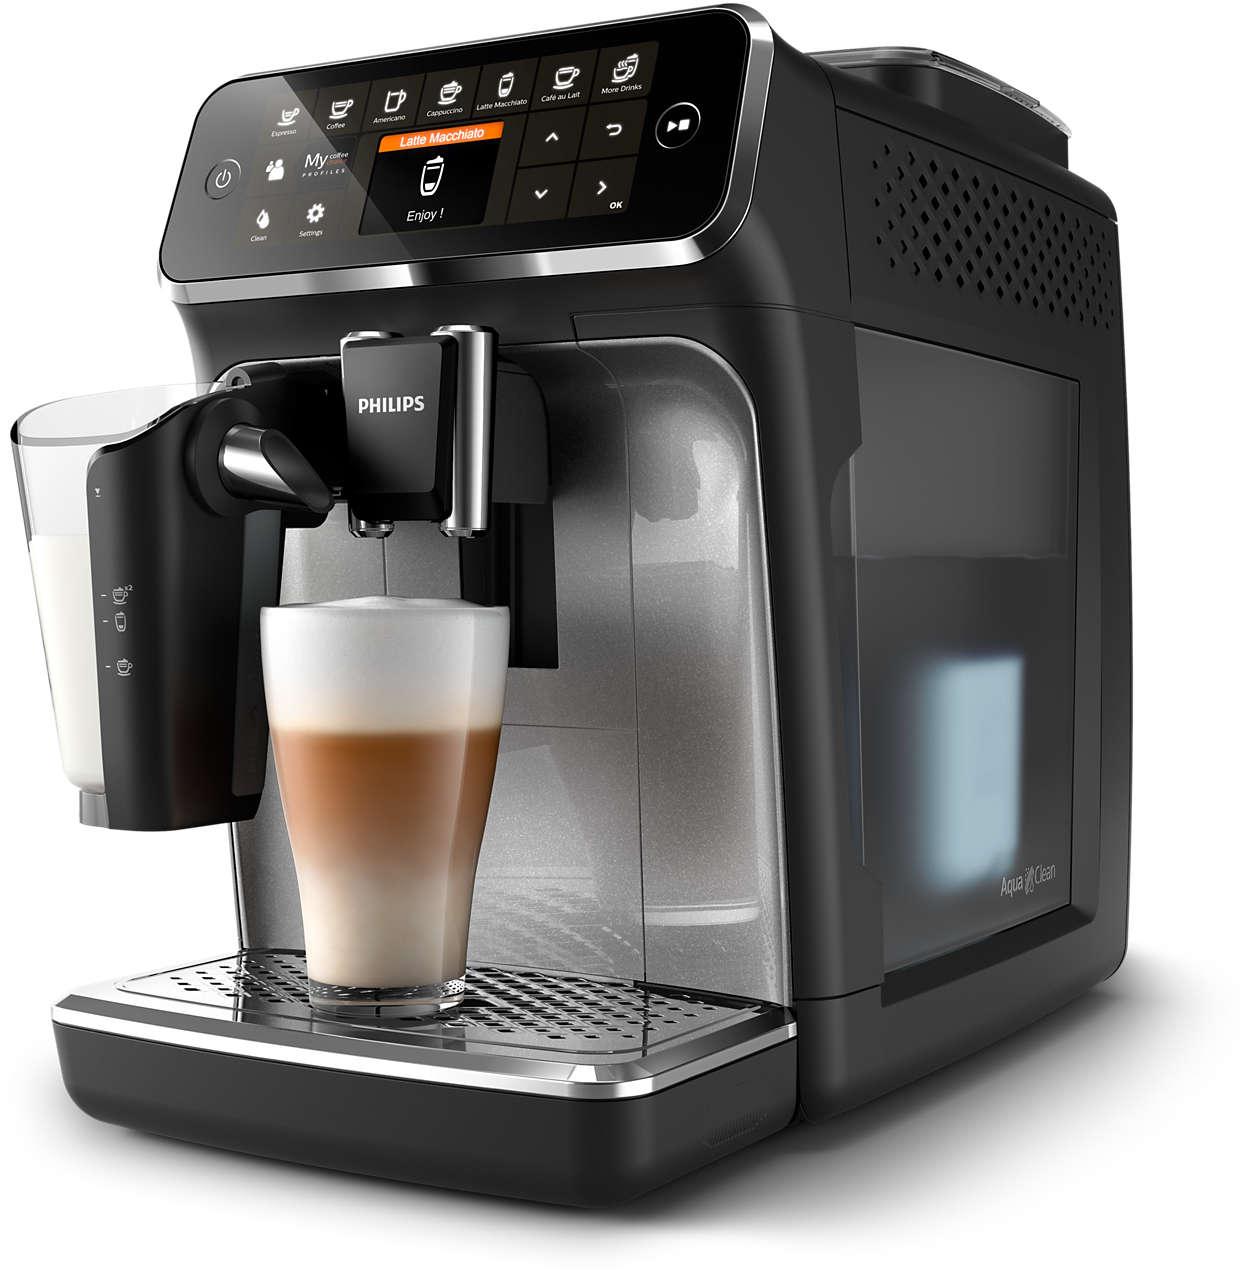 8 deliziose varietà di caffè da chicchi freschi, senza sforzi